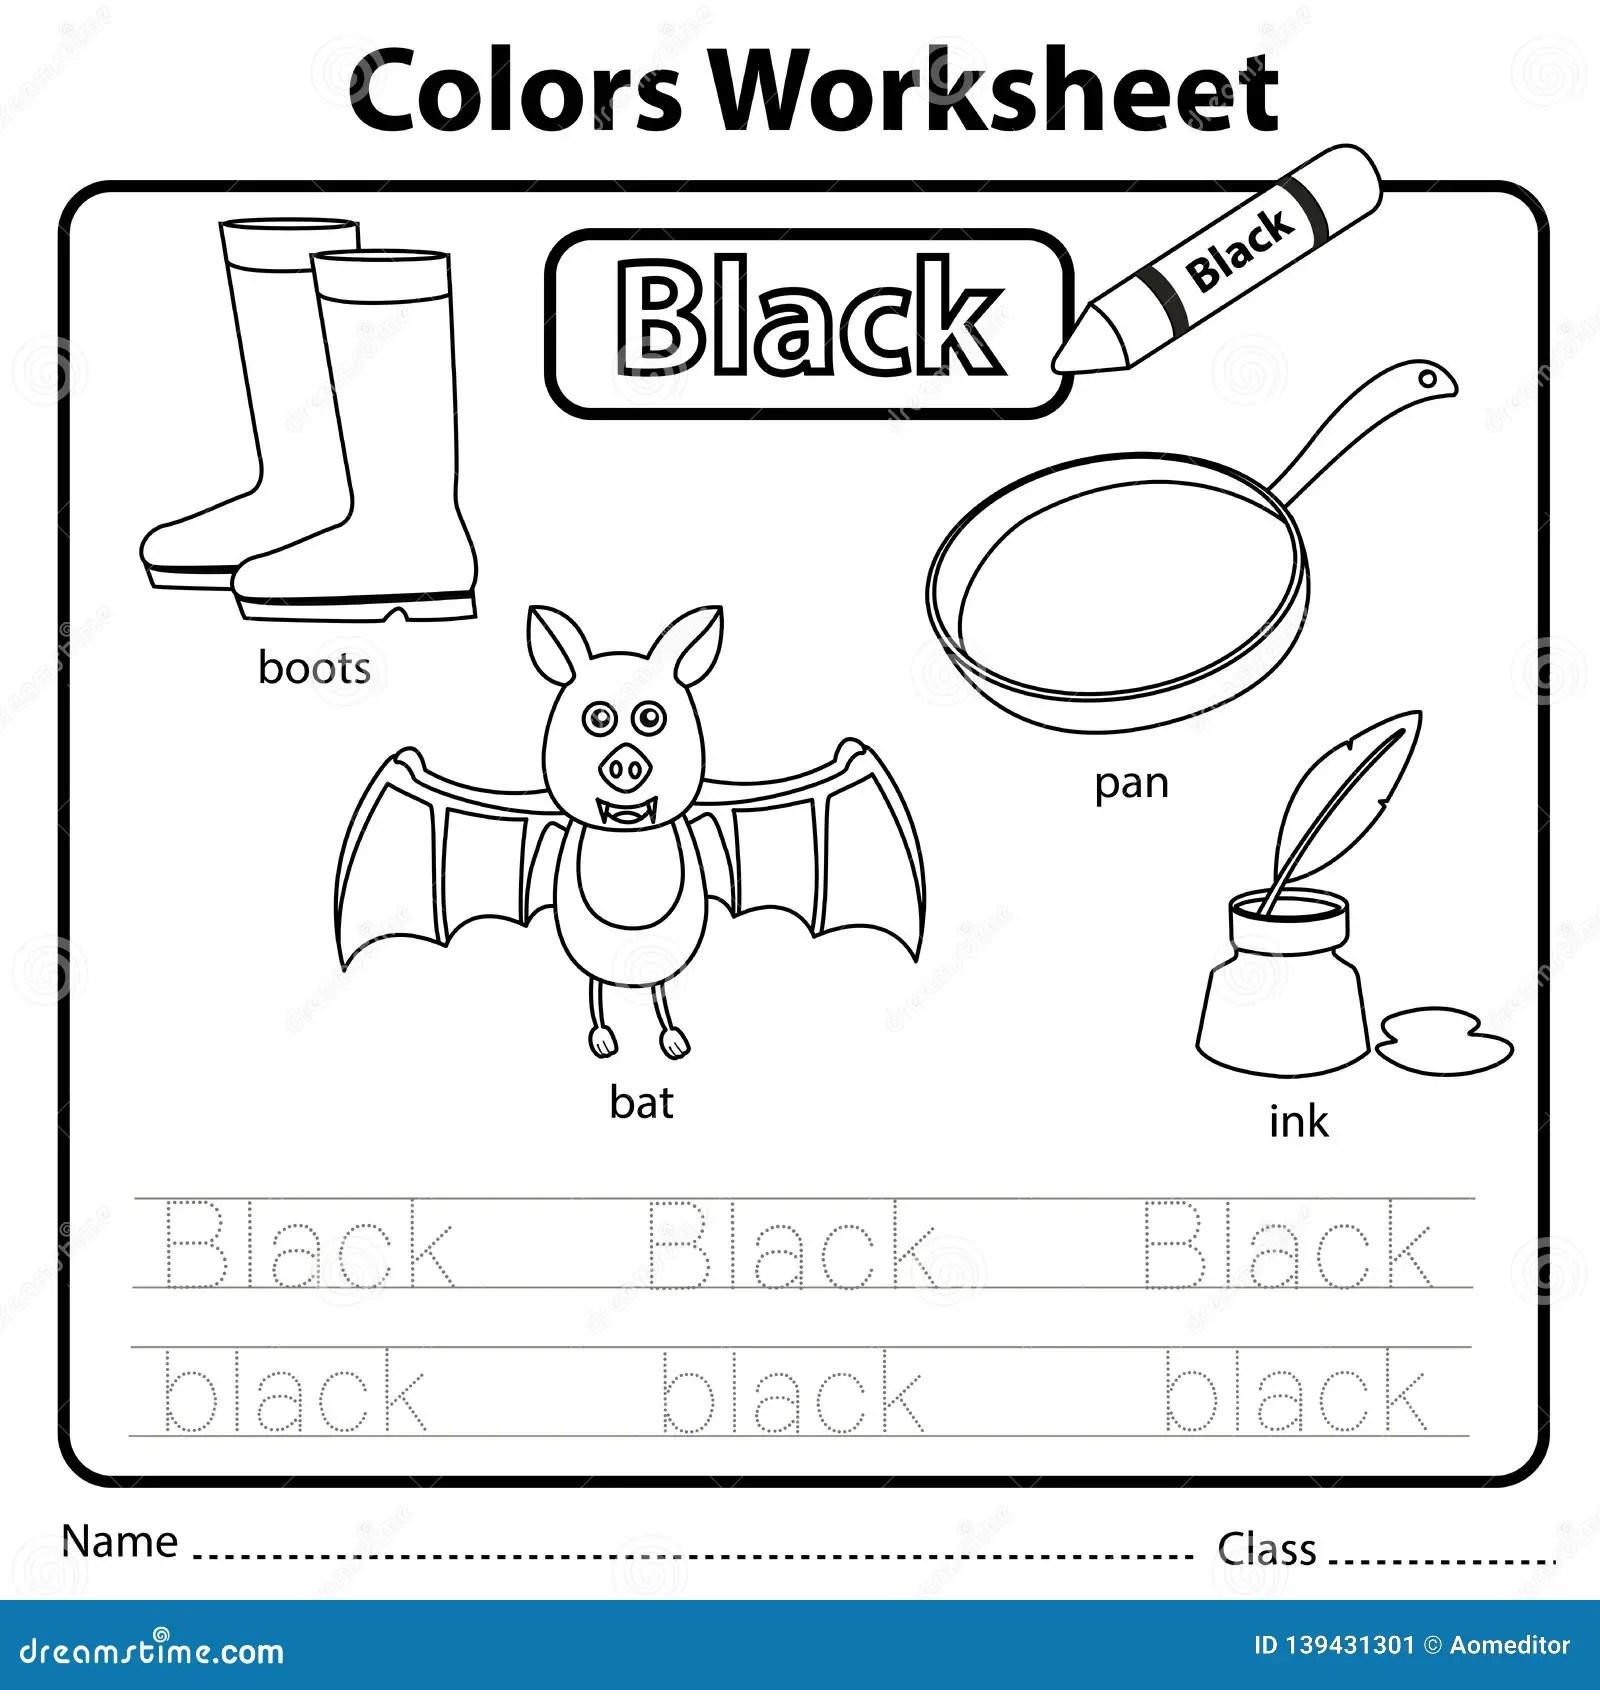 Illustrator Of Color Worksheet Black Stock Vector